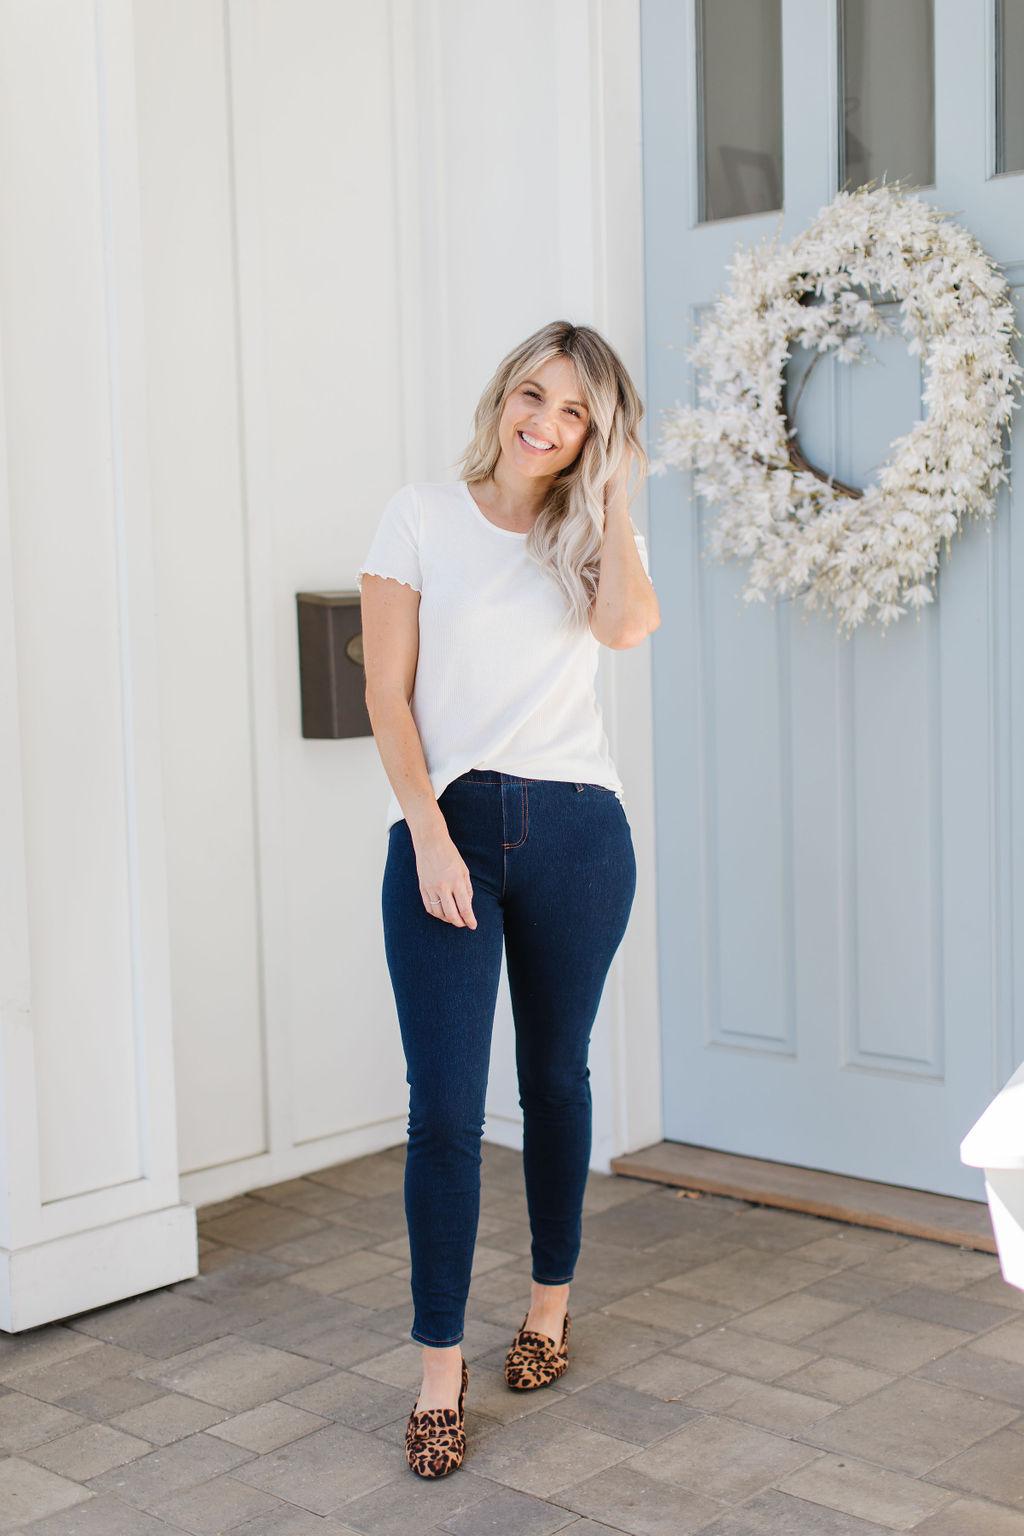 $9 jeans affordable walmart